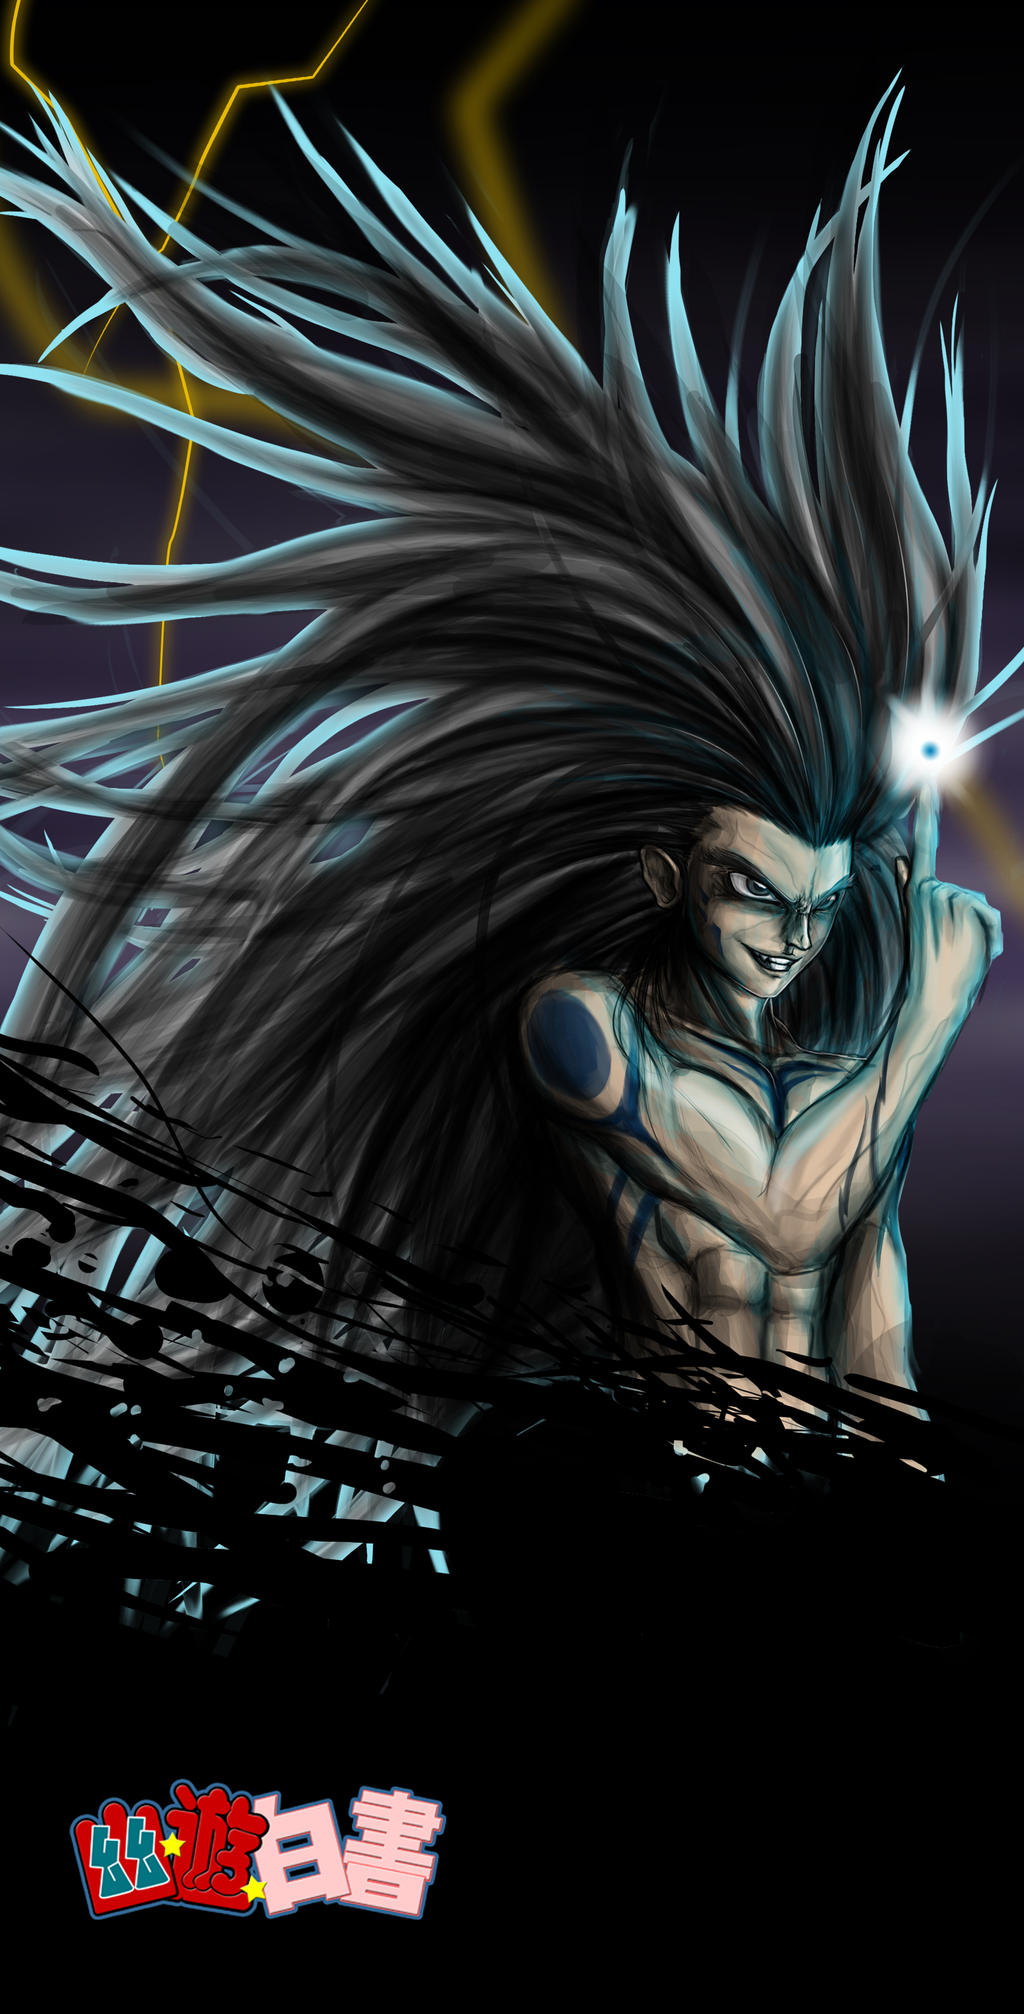 yusuke by flangeloni on deviantart